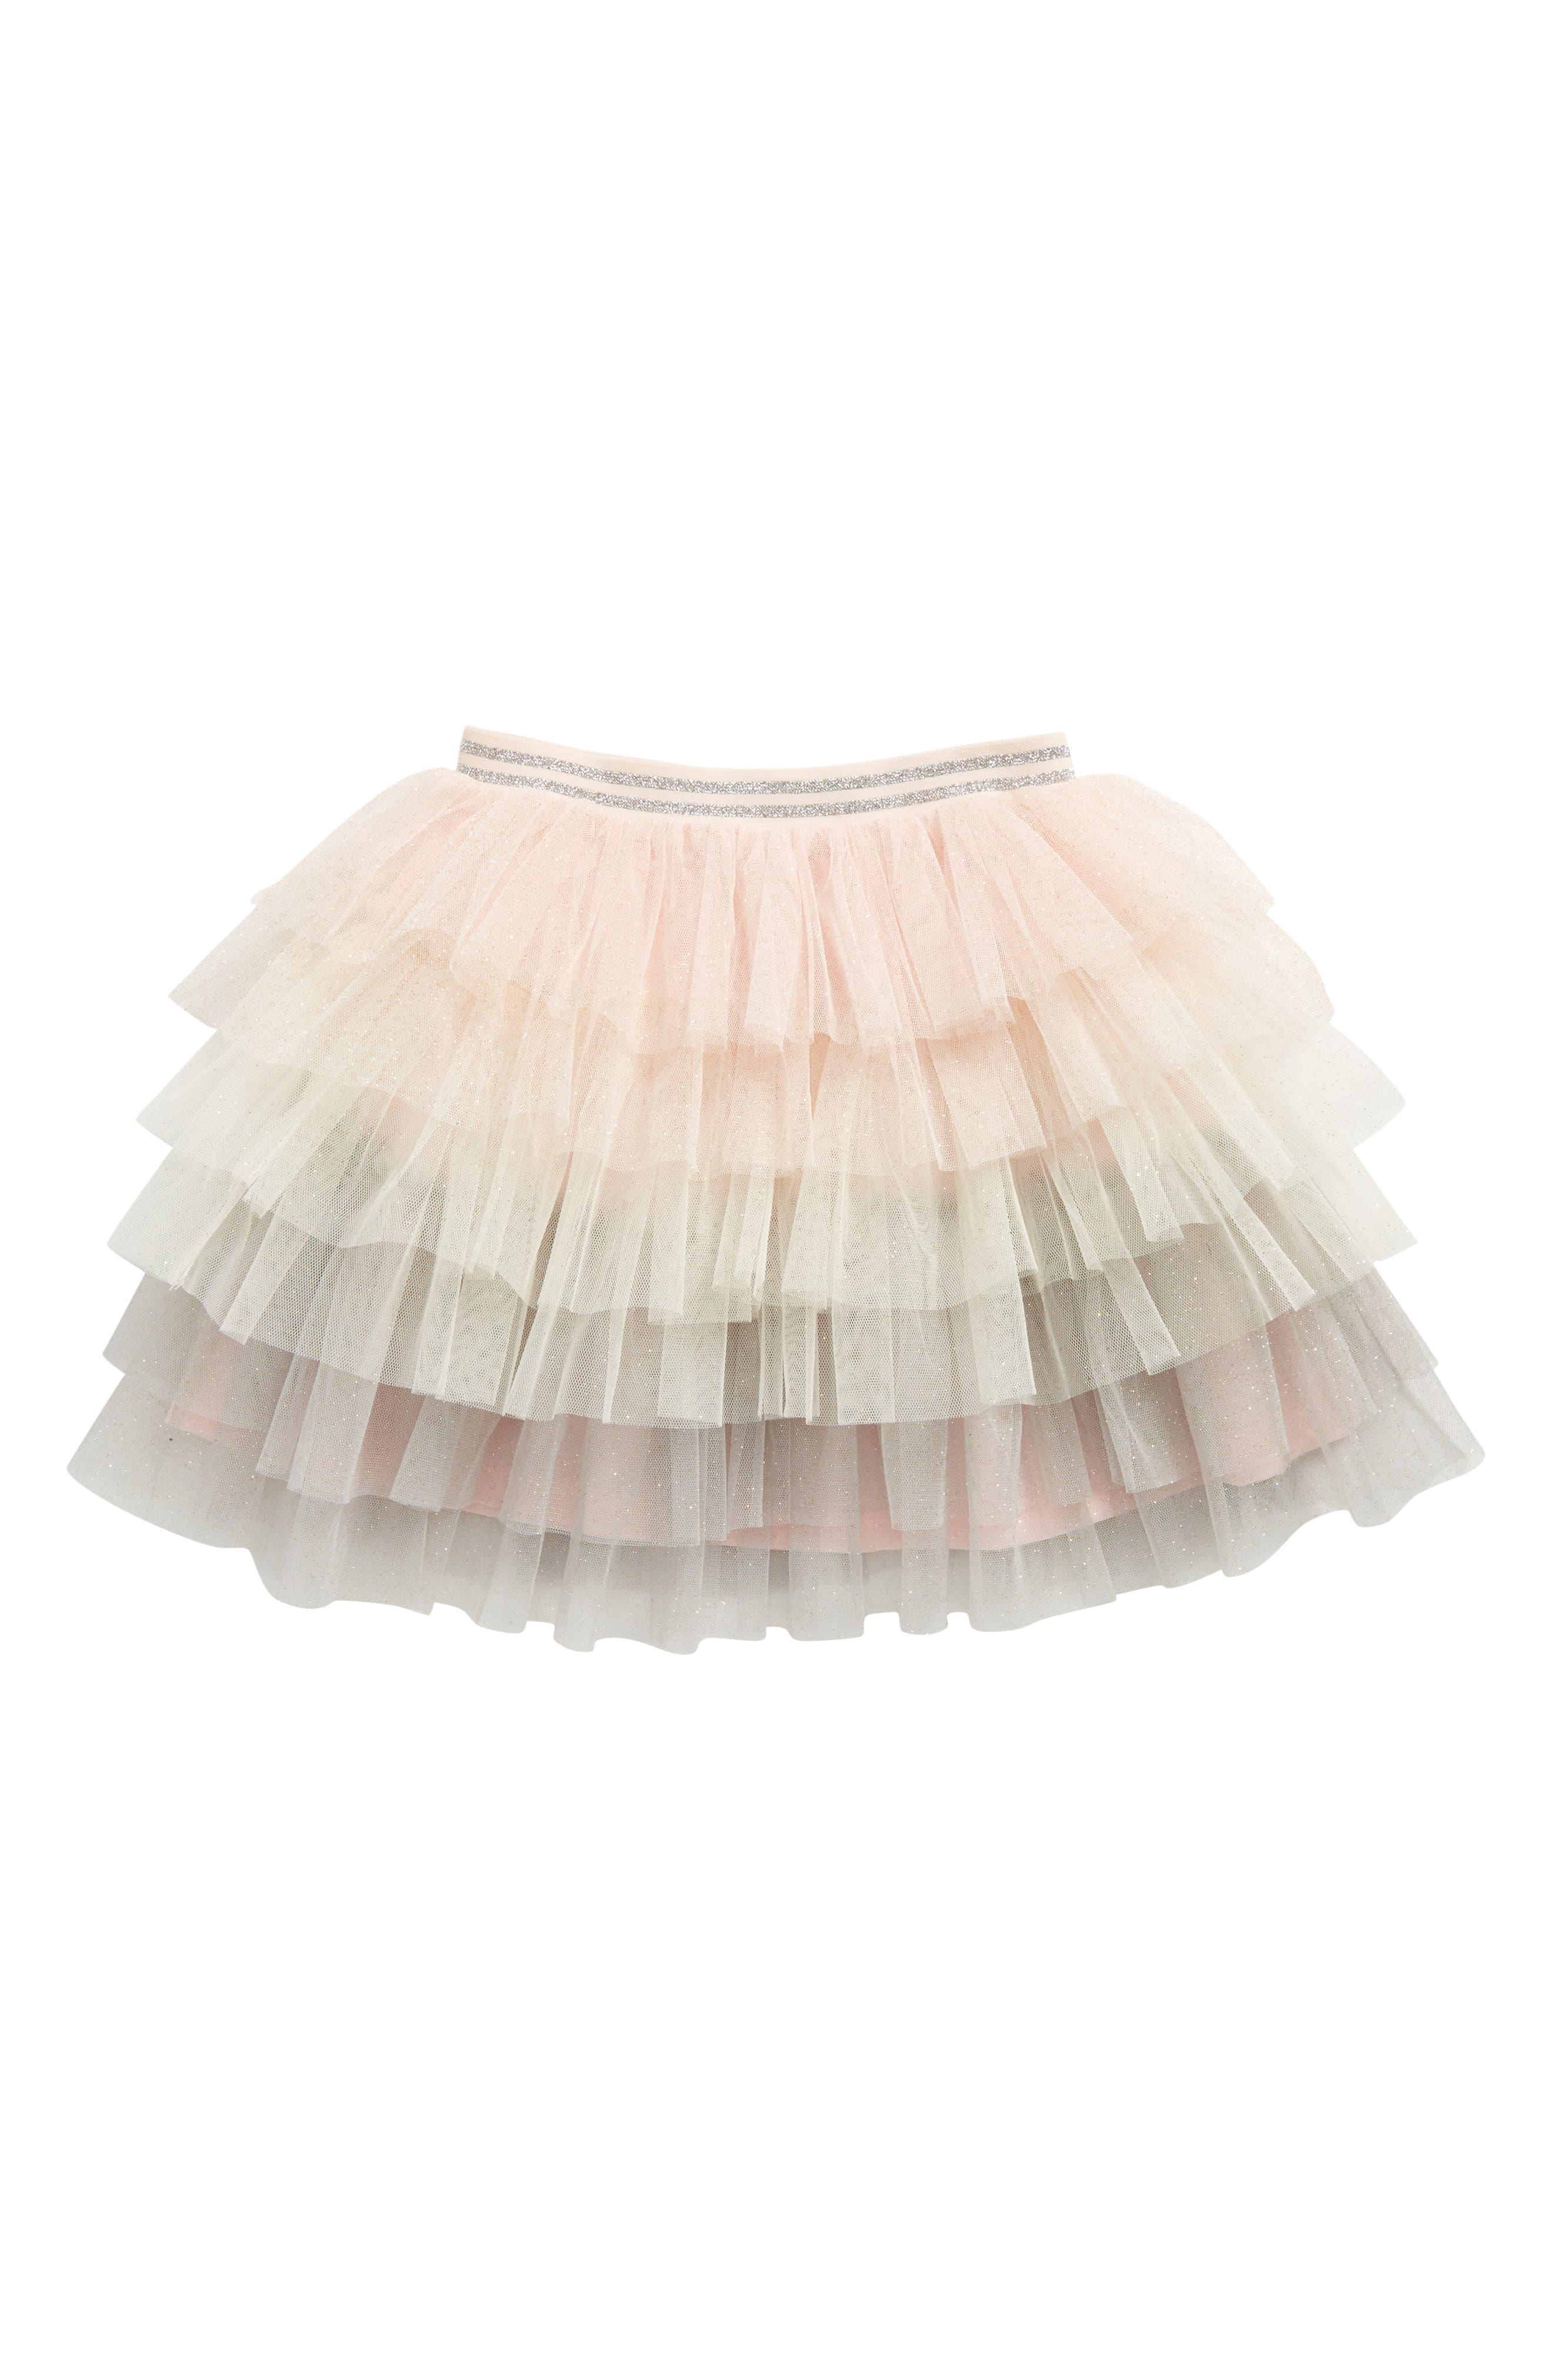 Tiered Tutu Skirt,                         Main,                         color, 651